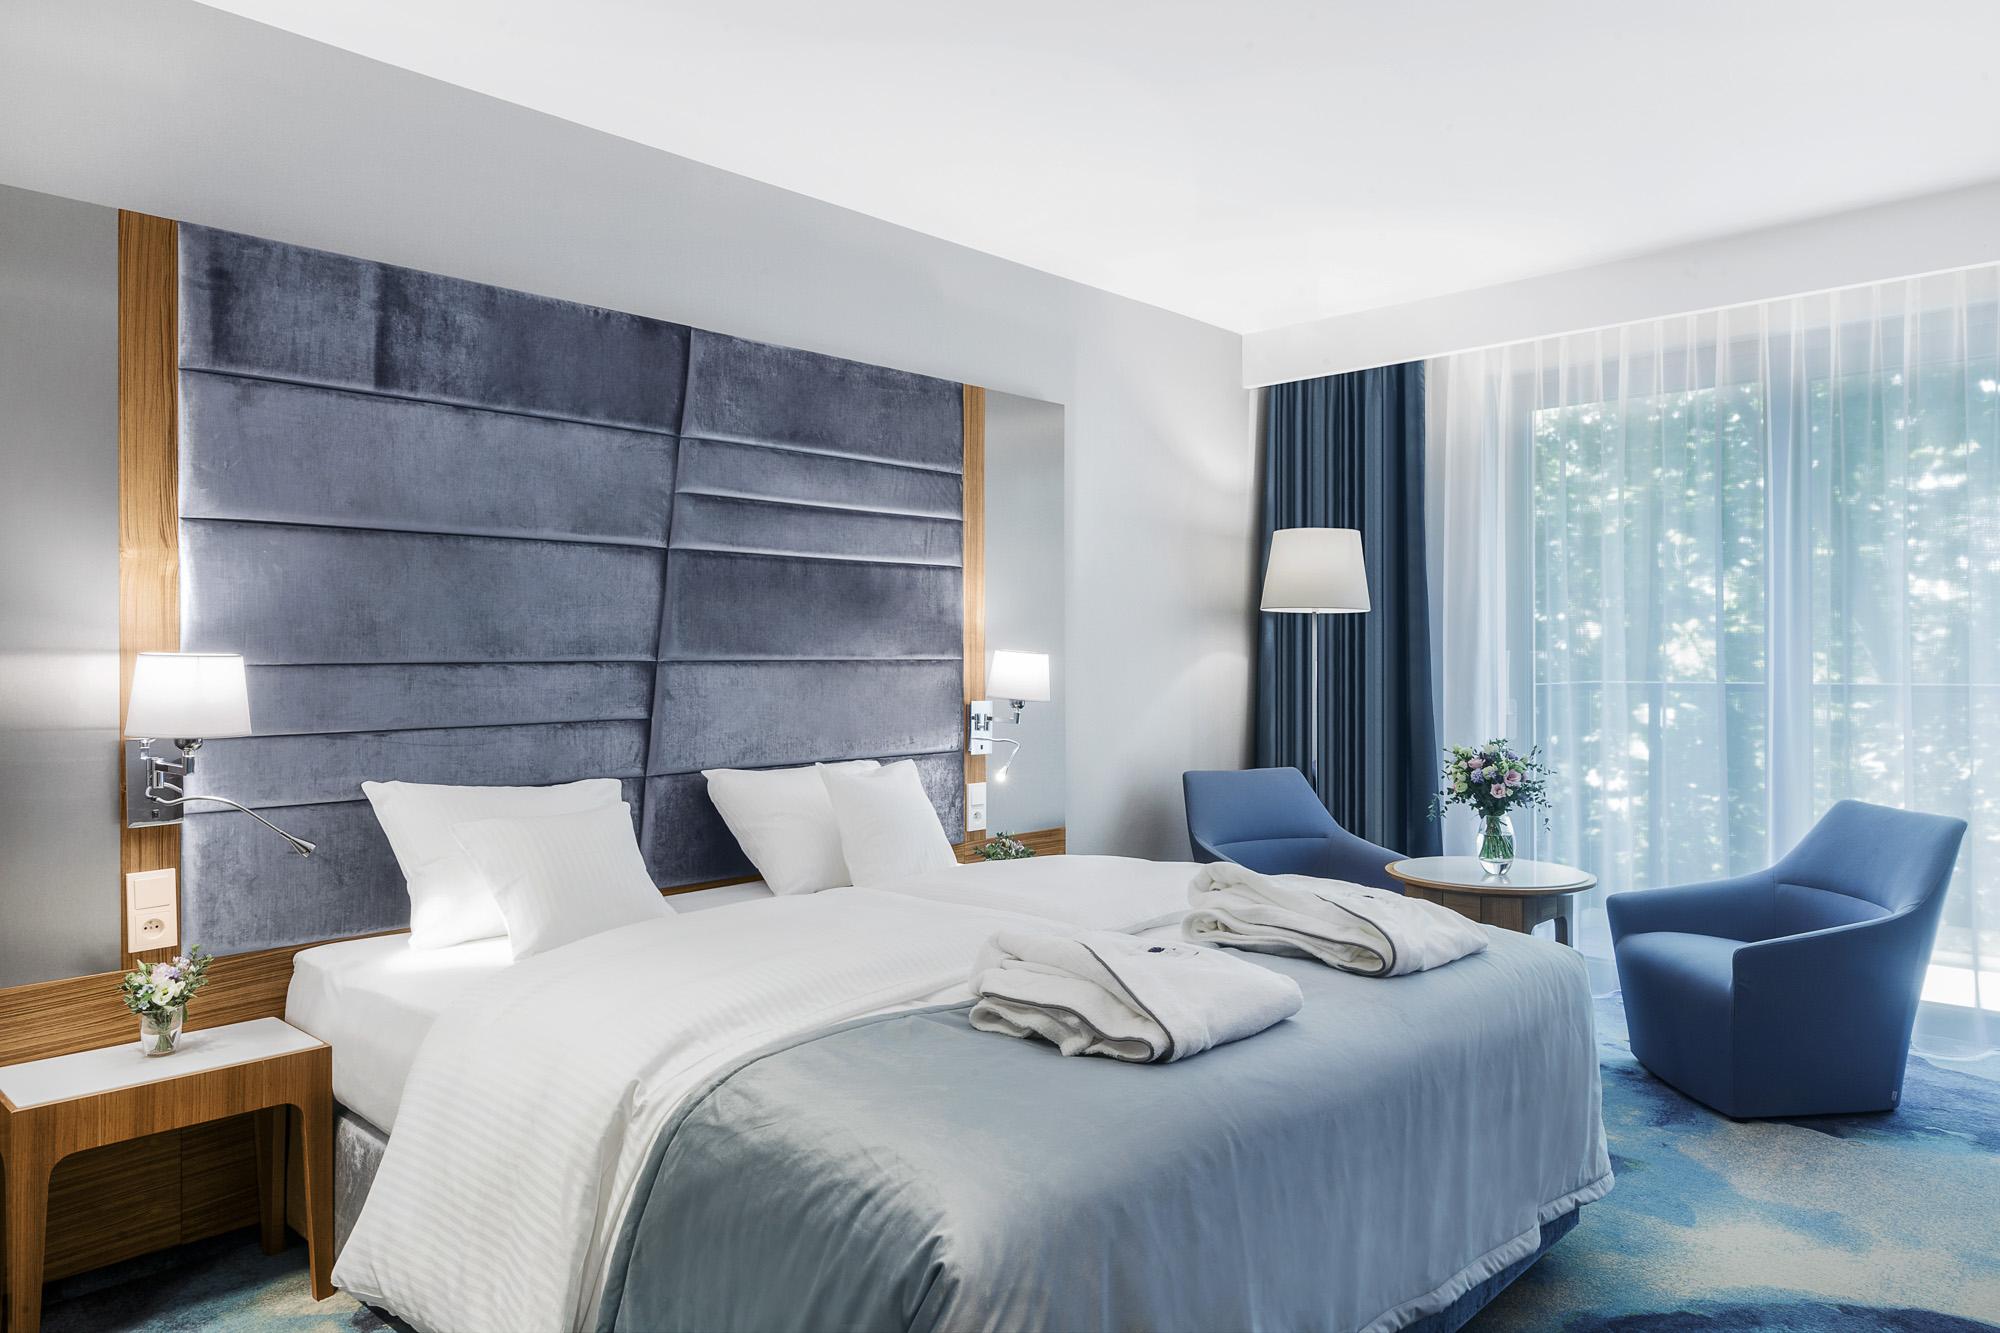 Hotel Testa - Pokój EconomyHotel Testa - Pokój Standard